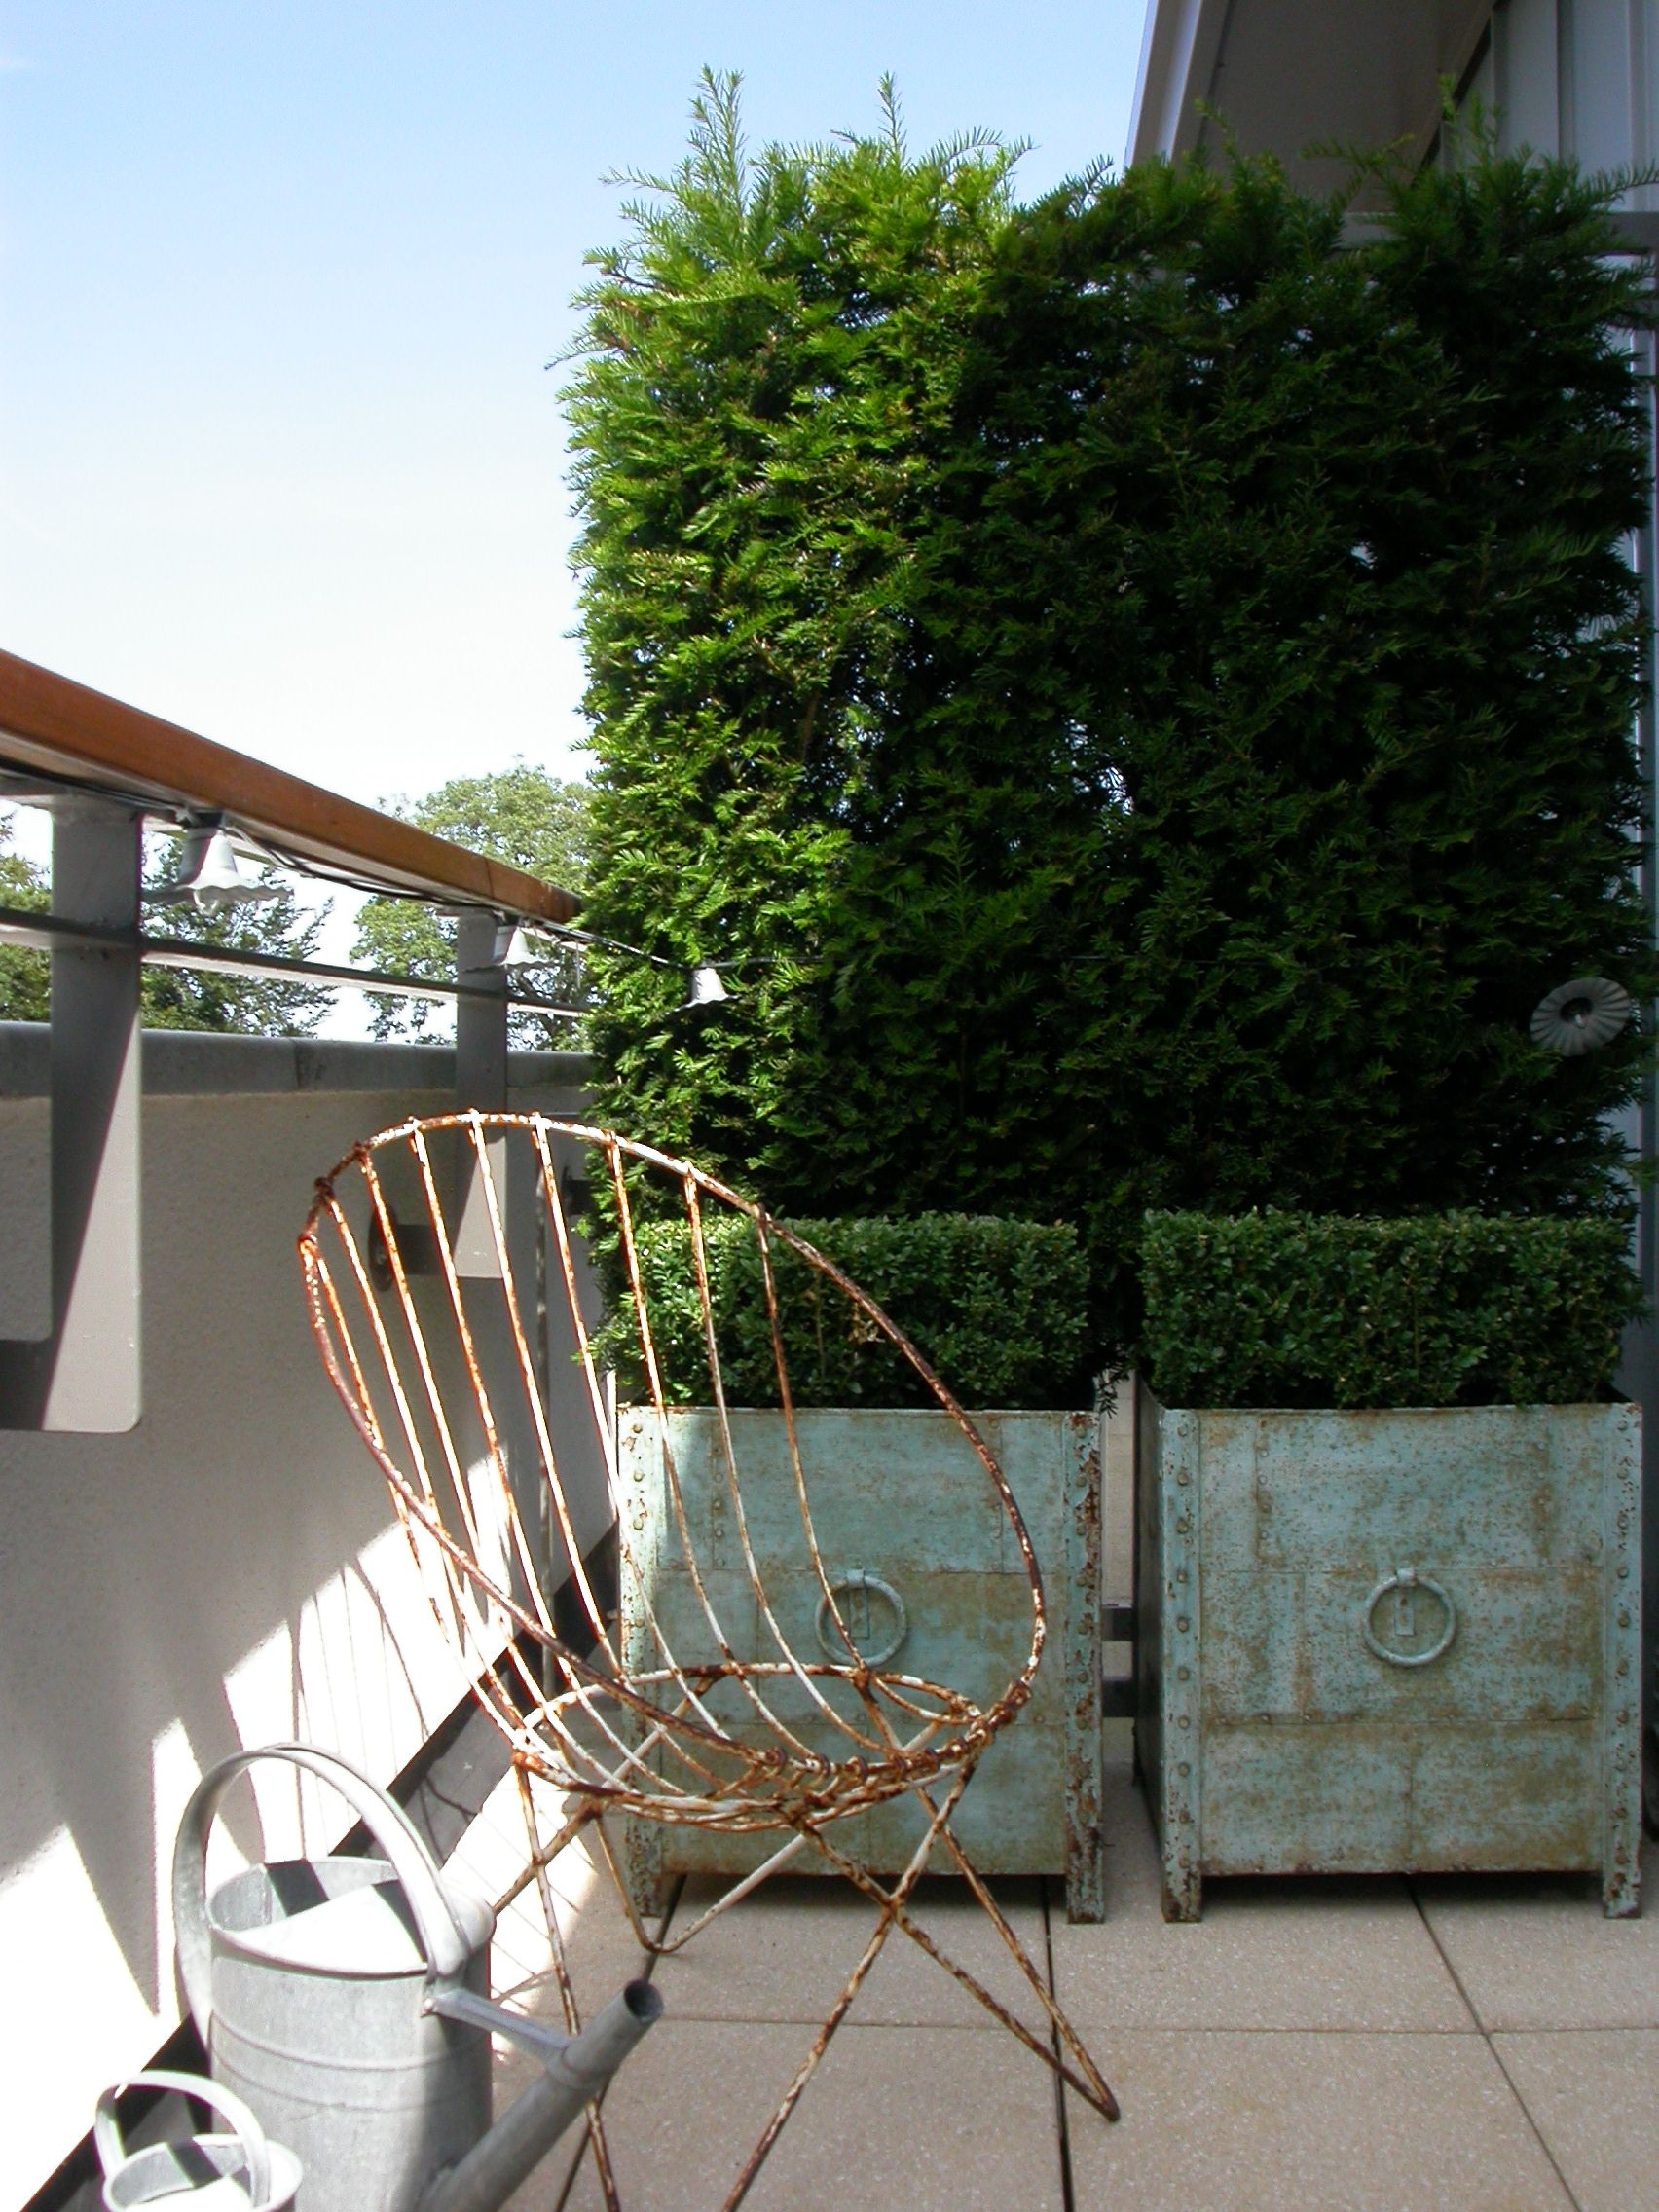 Instant screening using Yew hedging on Dublin city balcony